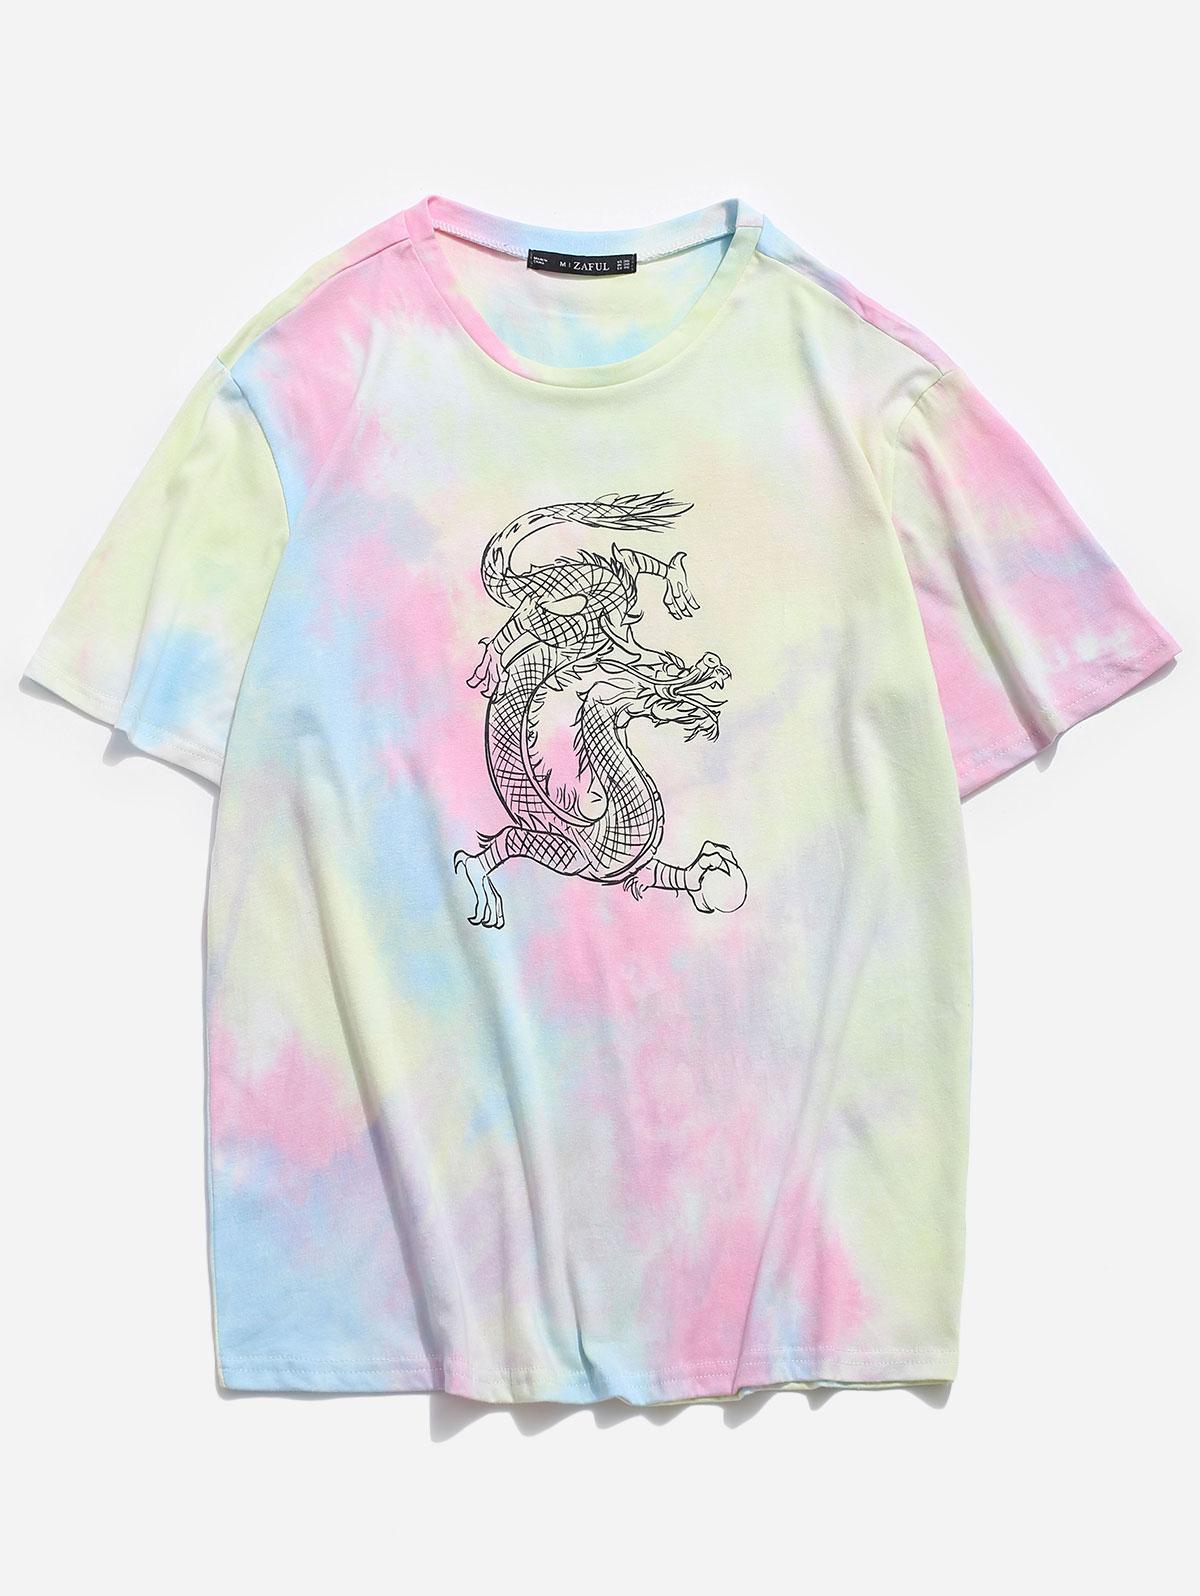 Mens Caterpillar Essential Work Short Sleeve T-Shirt Sizes S to 2XL